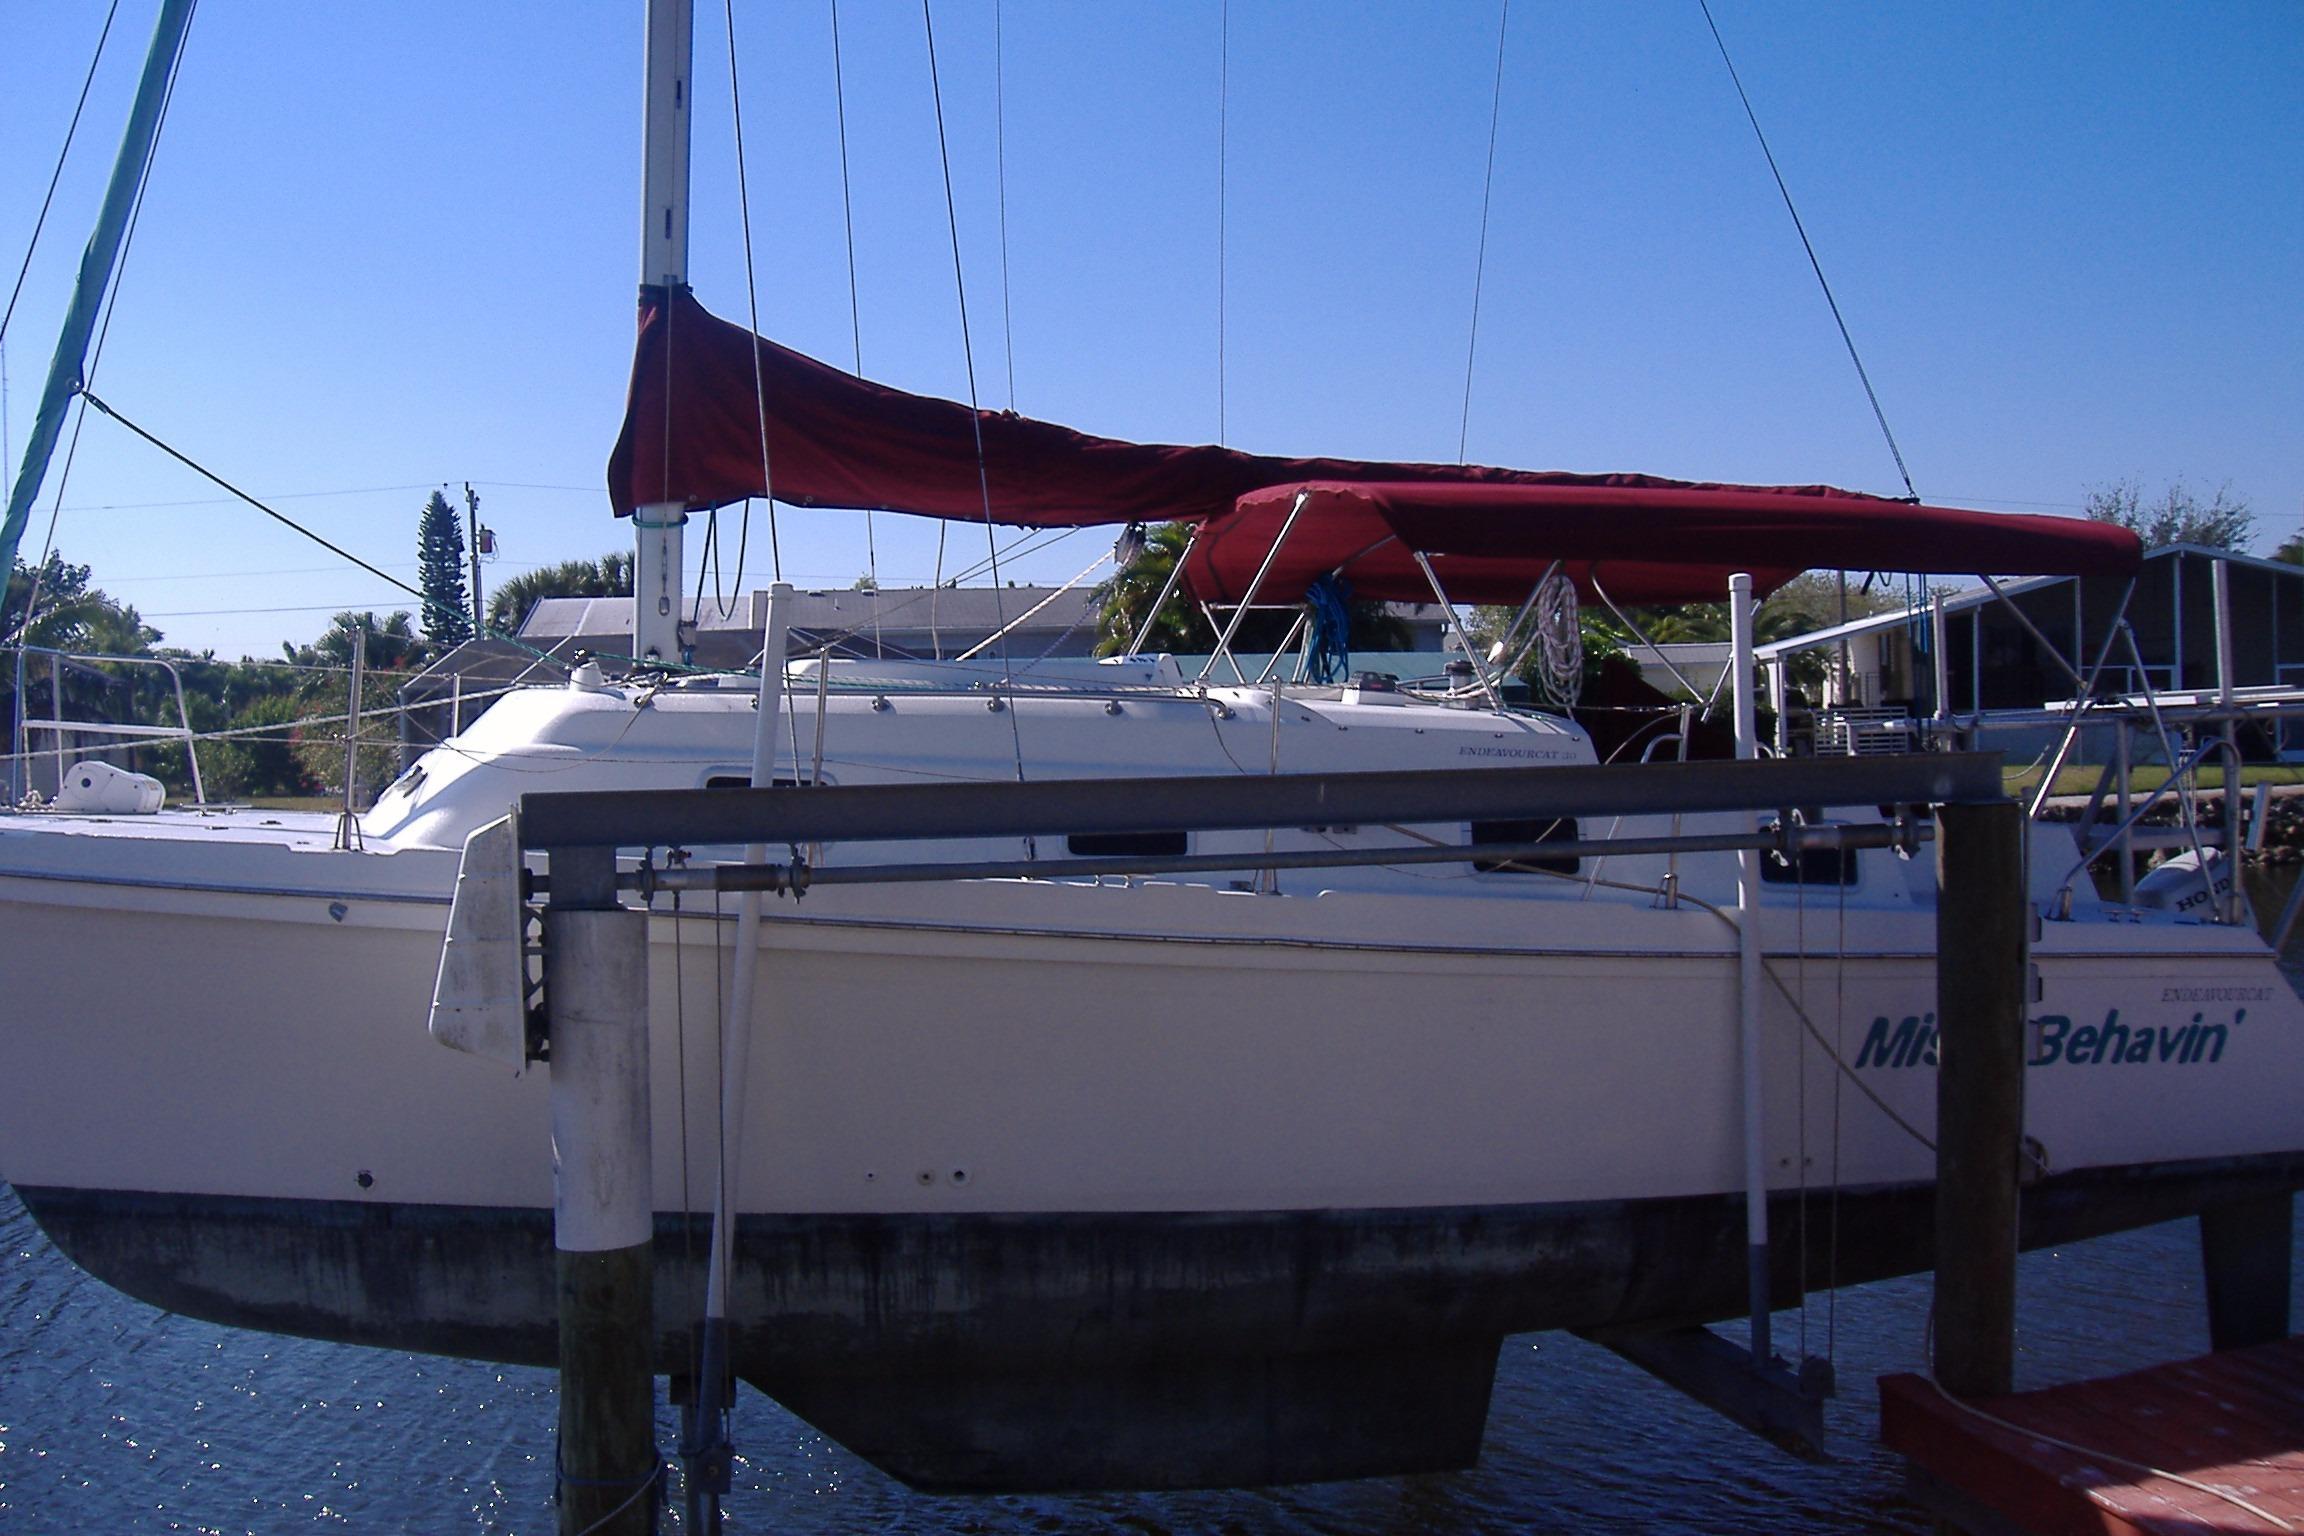 30' Endeavour Catamaran 1992 Endeavourcat 30